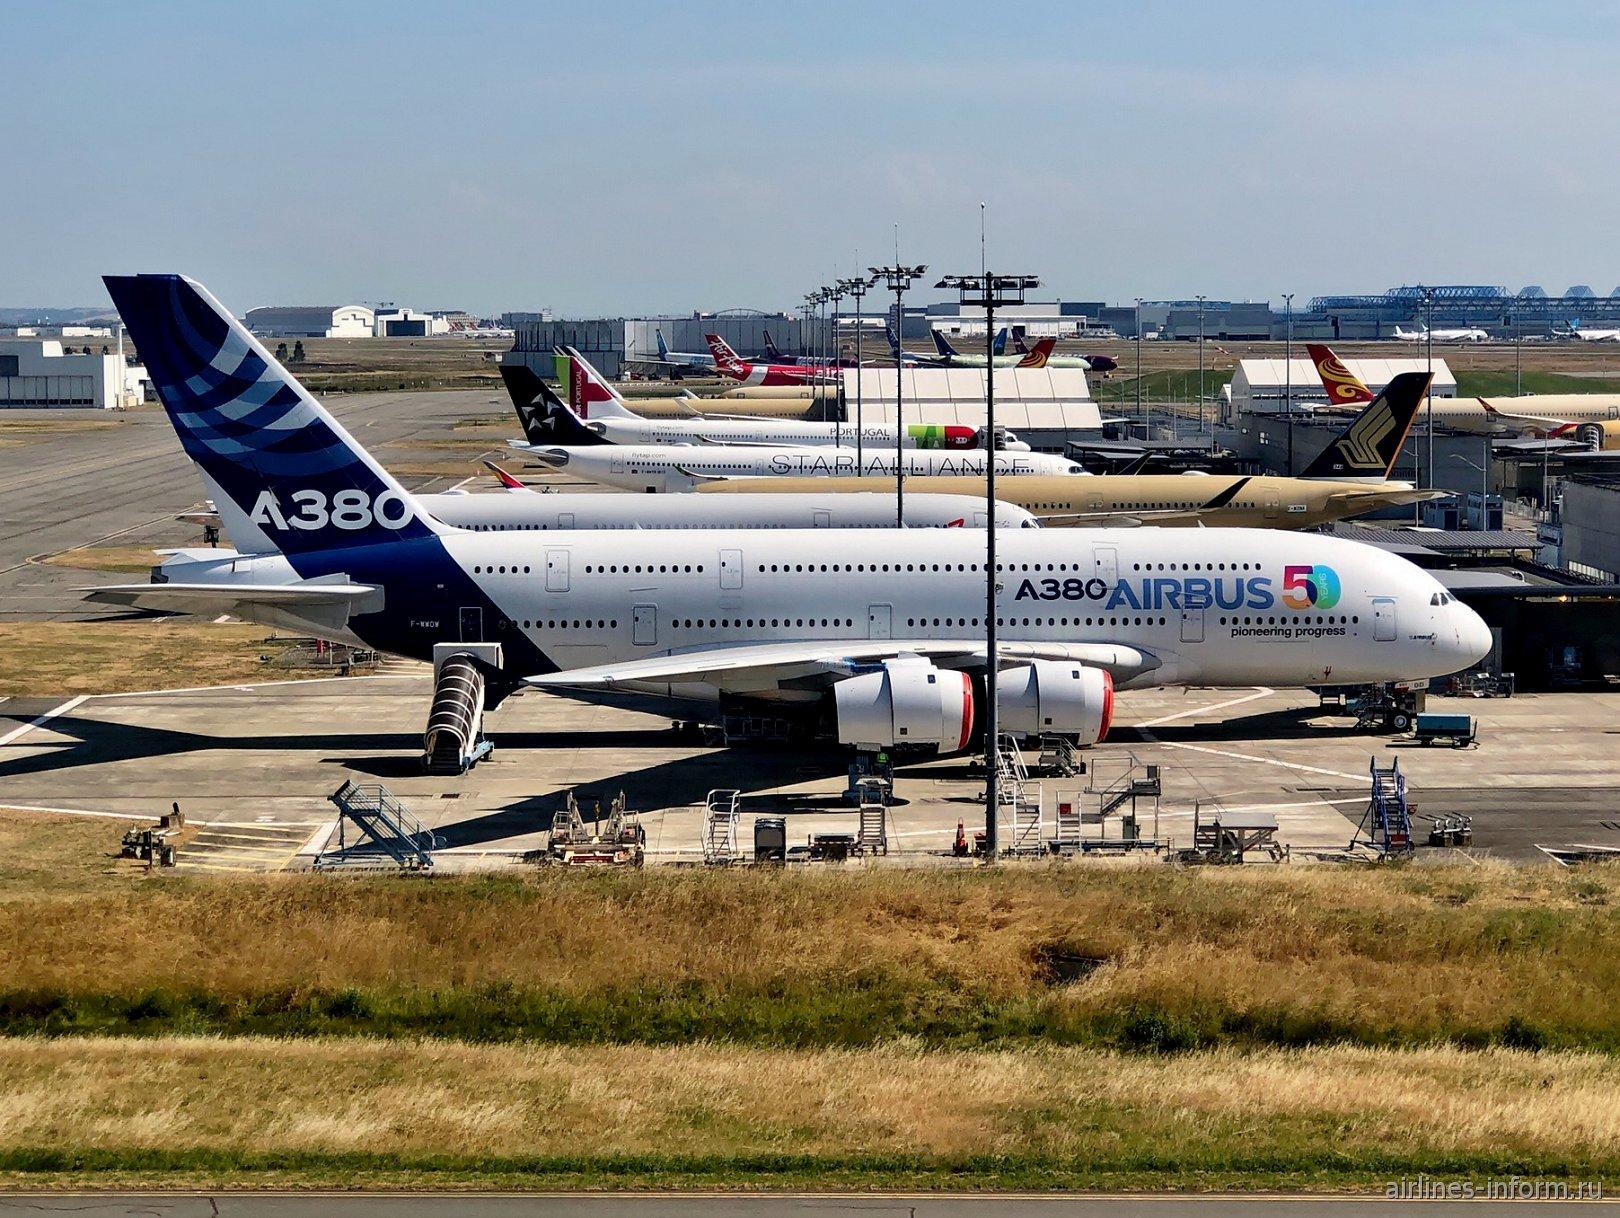 Самолет Airbus A380 на авиазаводе Airbus в Тулузе